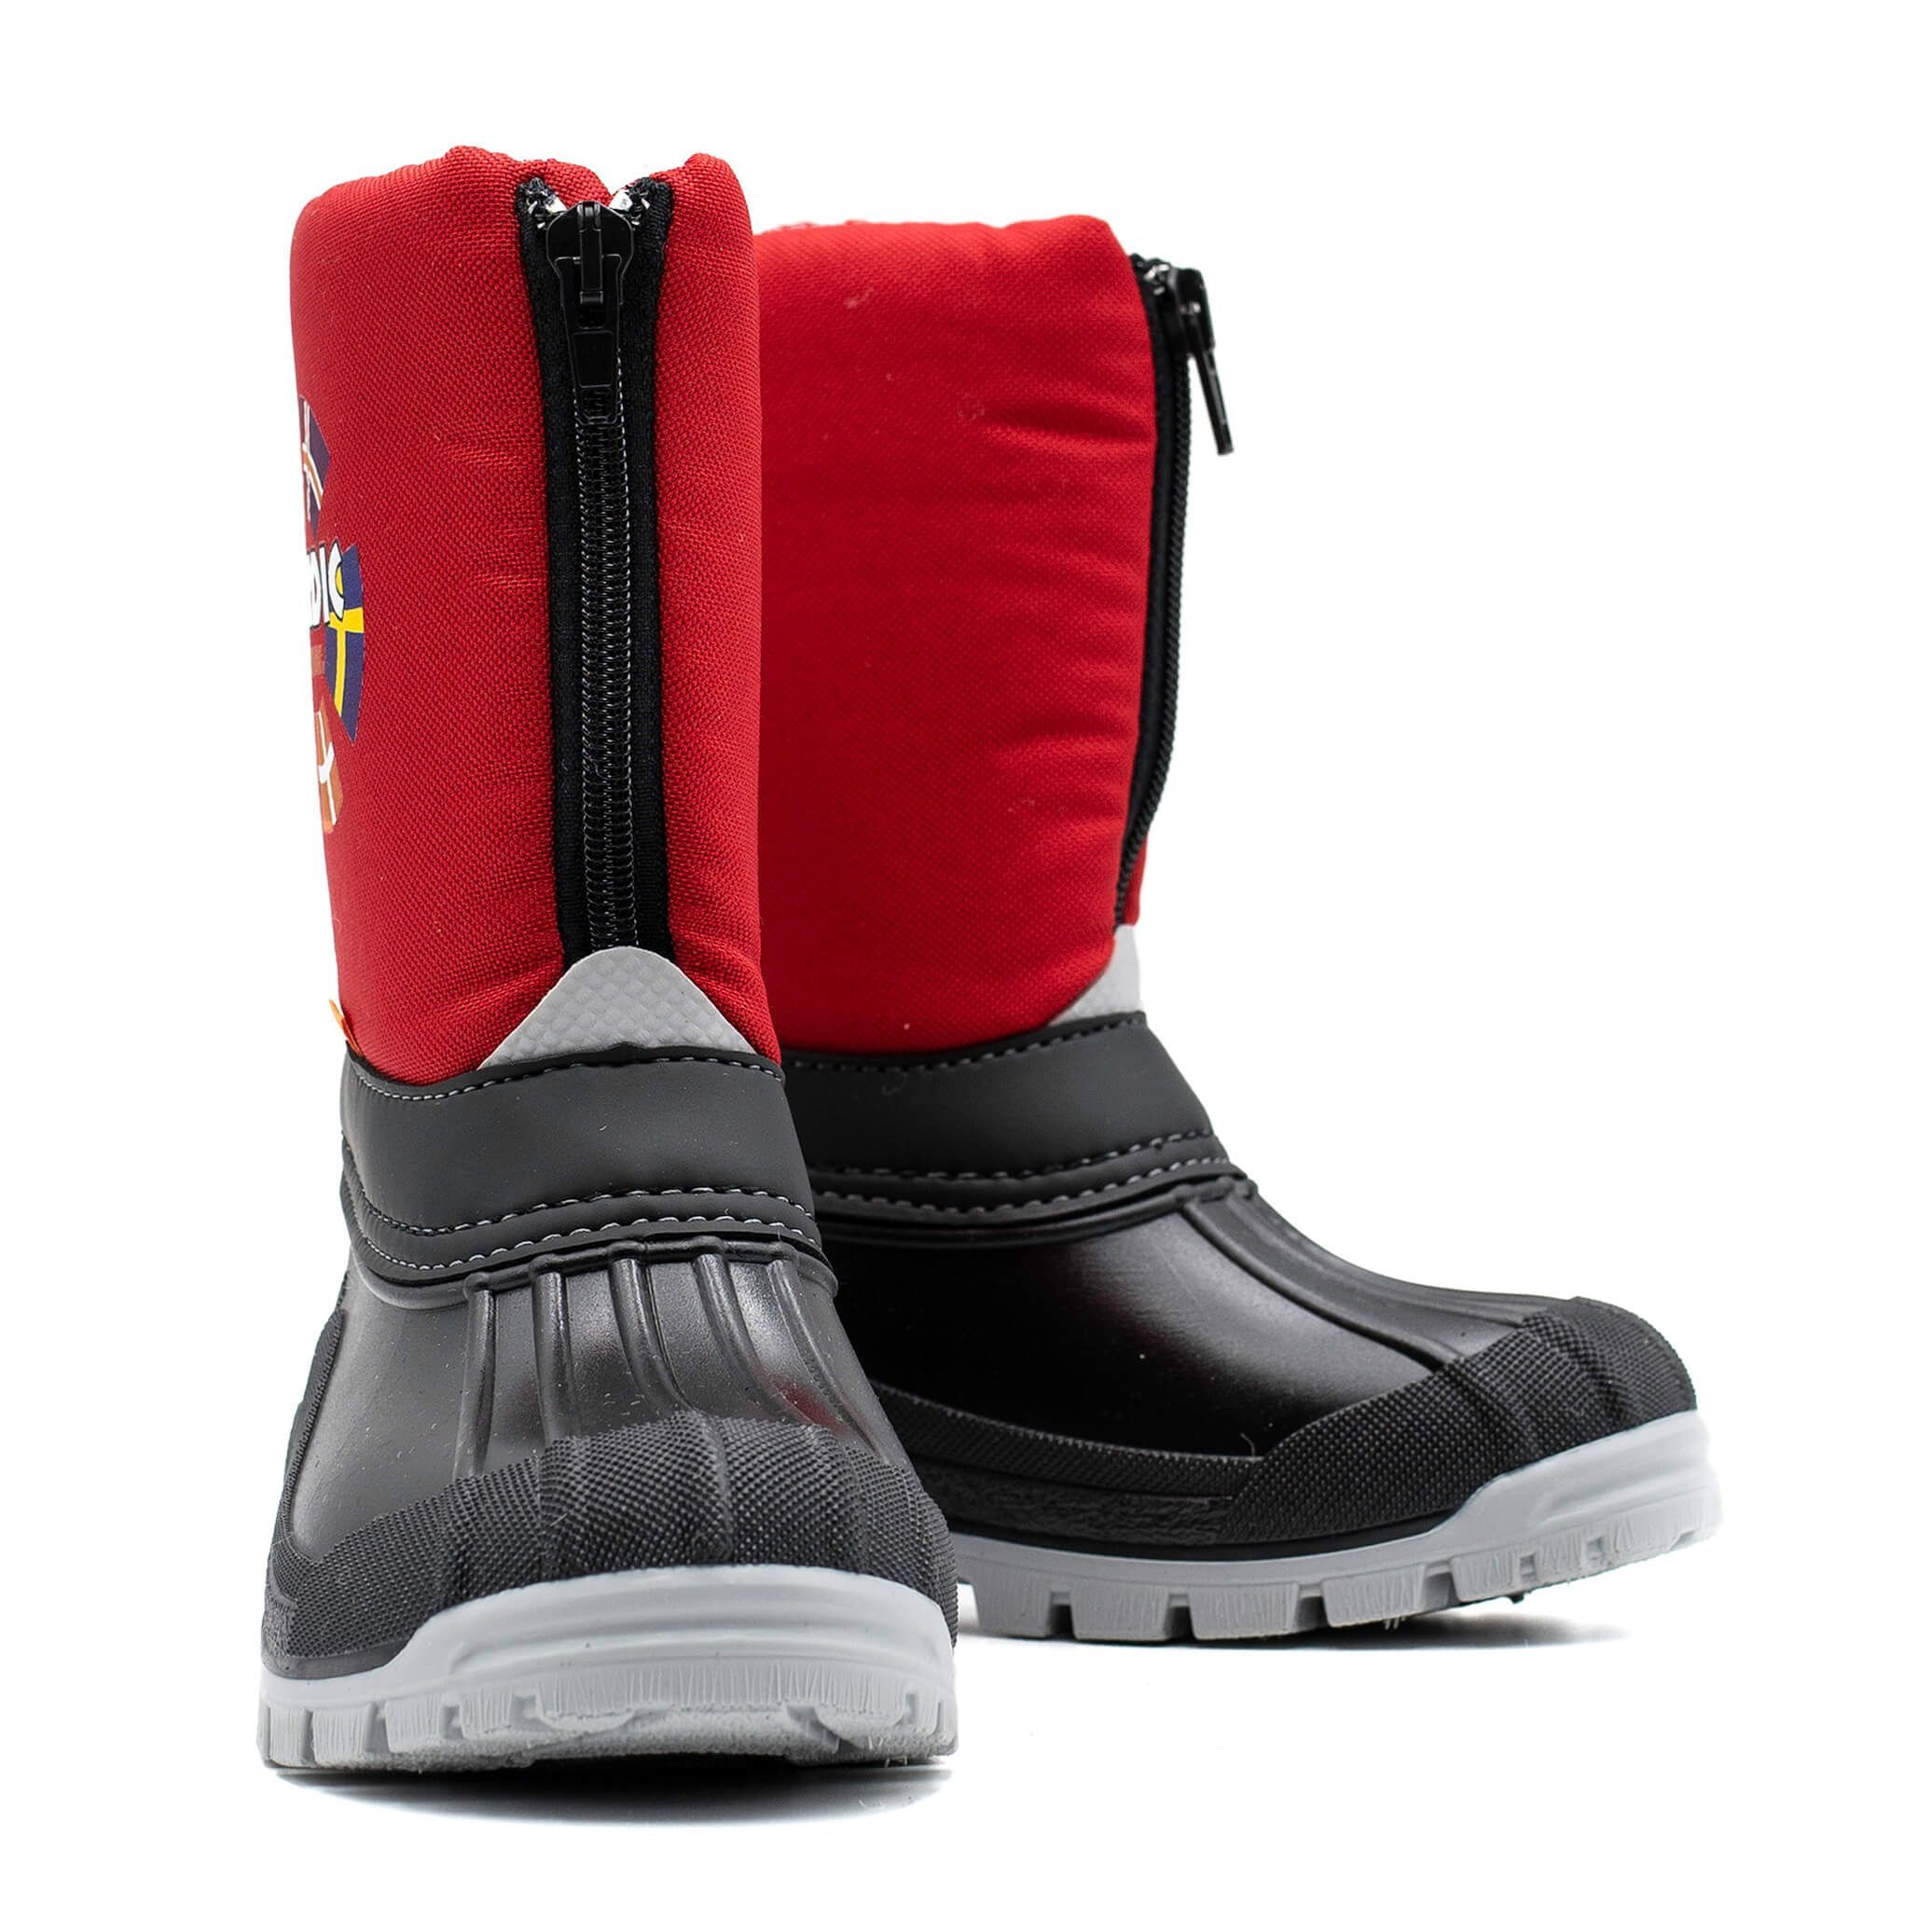 Buty Zimowe Ocieplane Sniegowce Zasuwane Demar New Nordic C Boots New Nordic Winter Boot